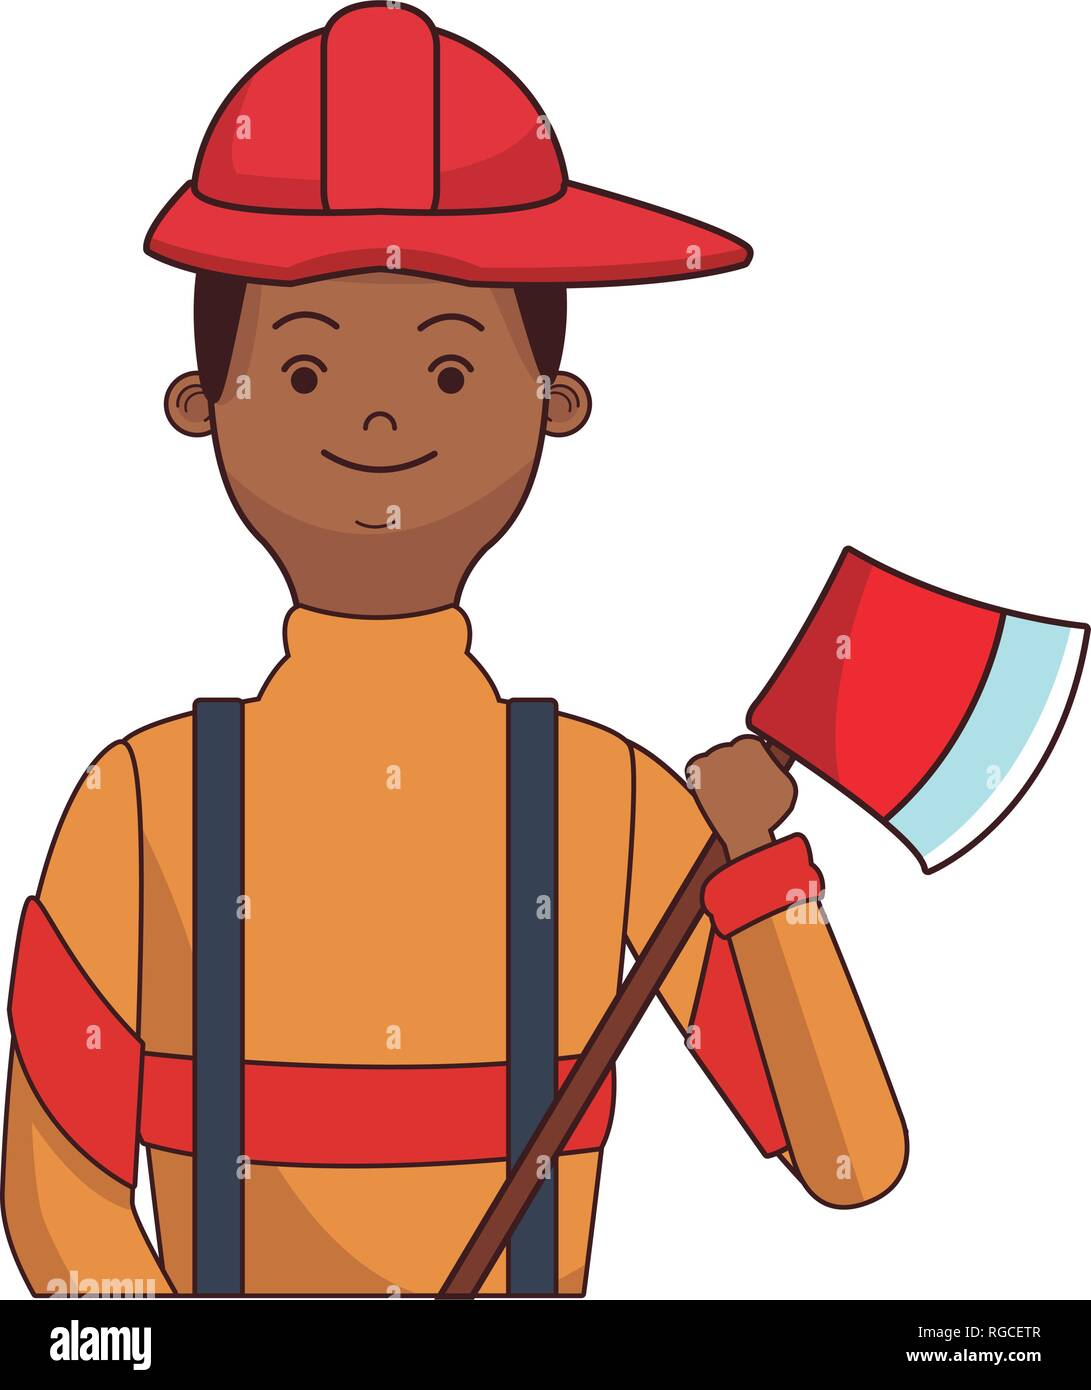 firefighter hero upperbody cartoon - Stock Vector